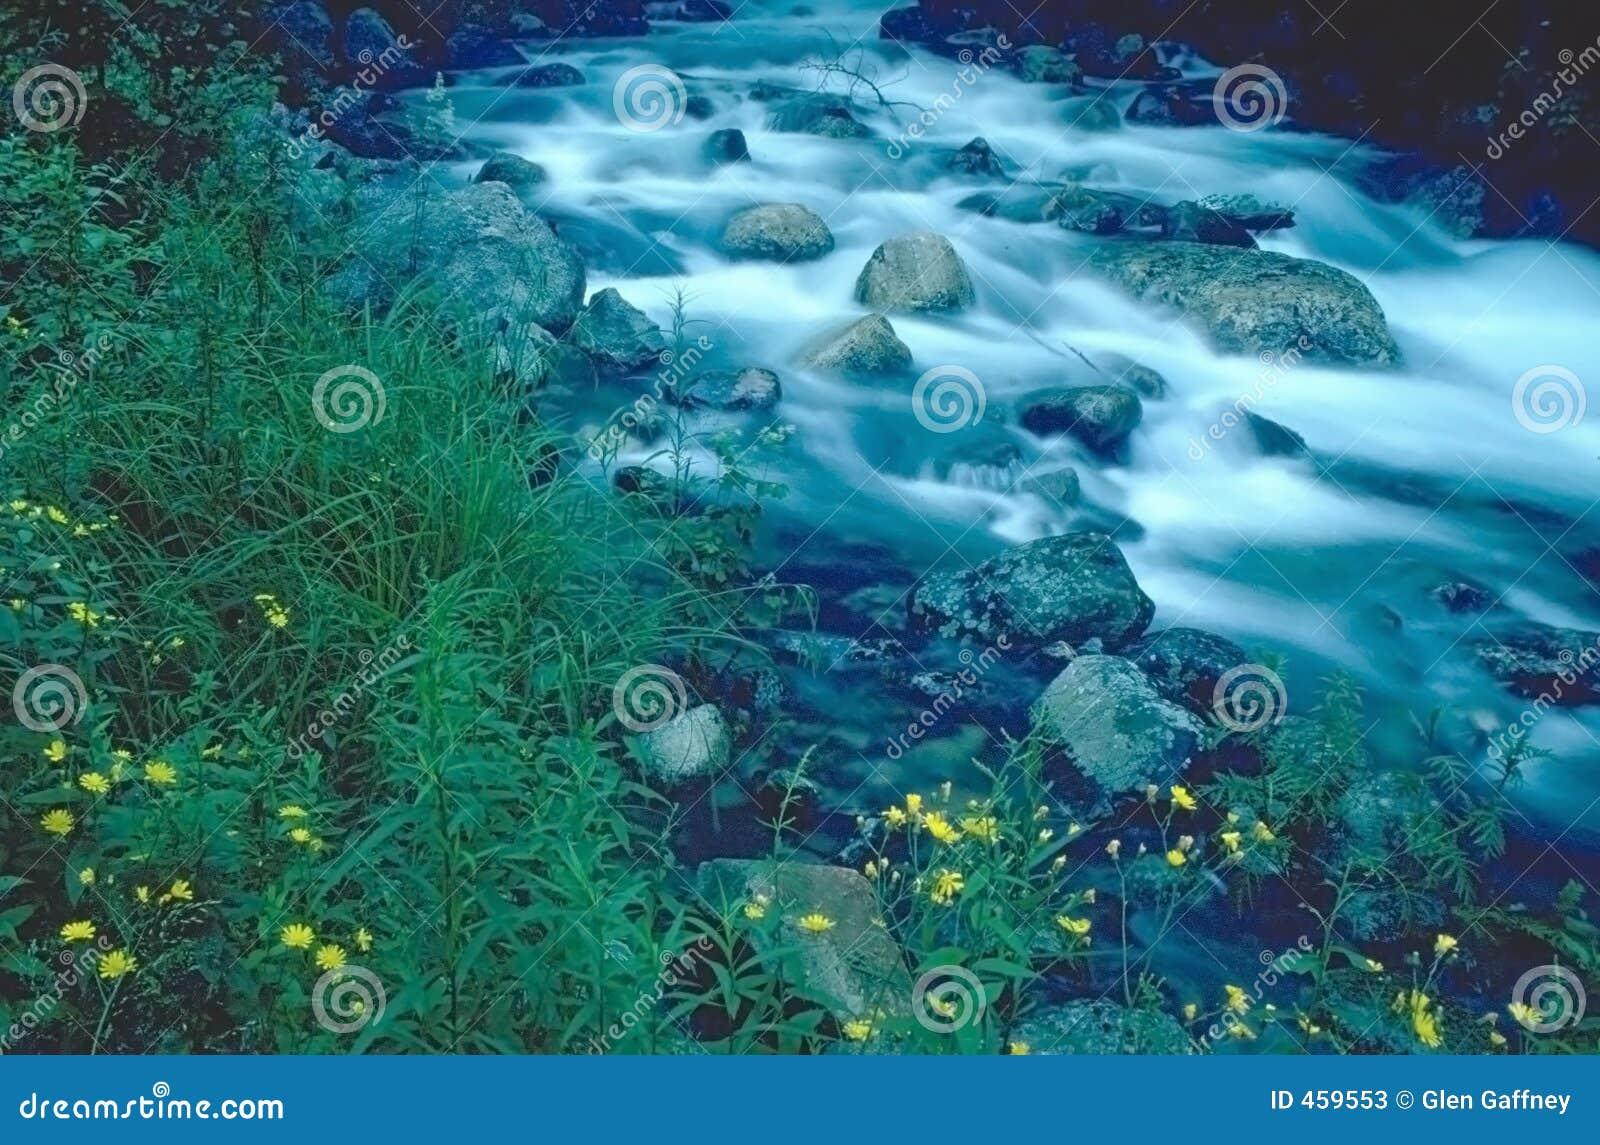 Download Running stream stock image. Image of weeds, landscapes - 459553